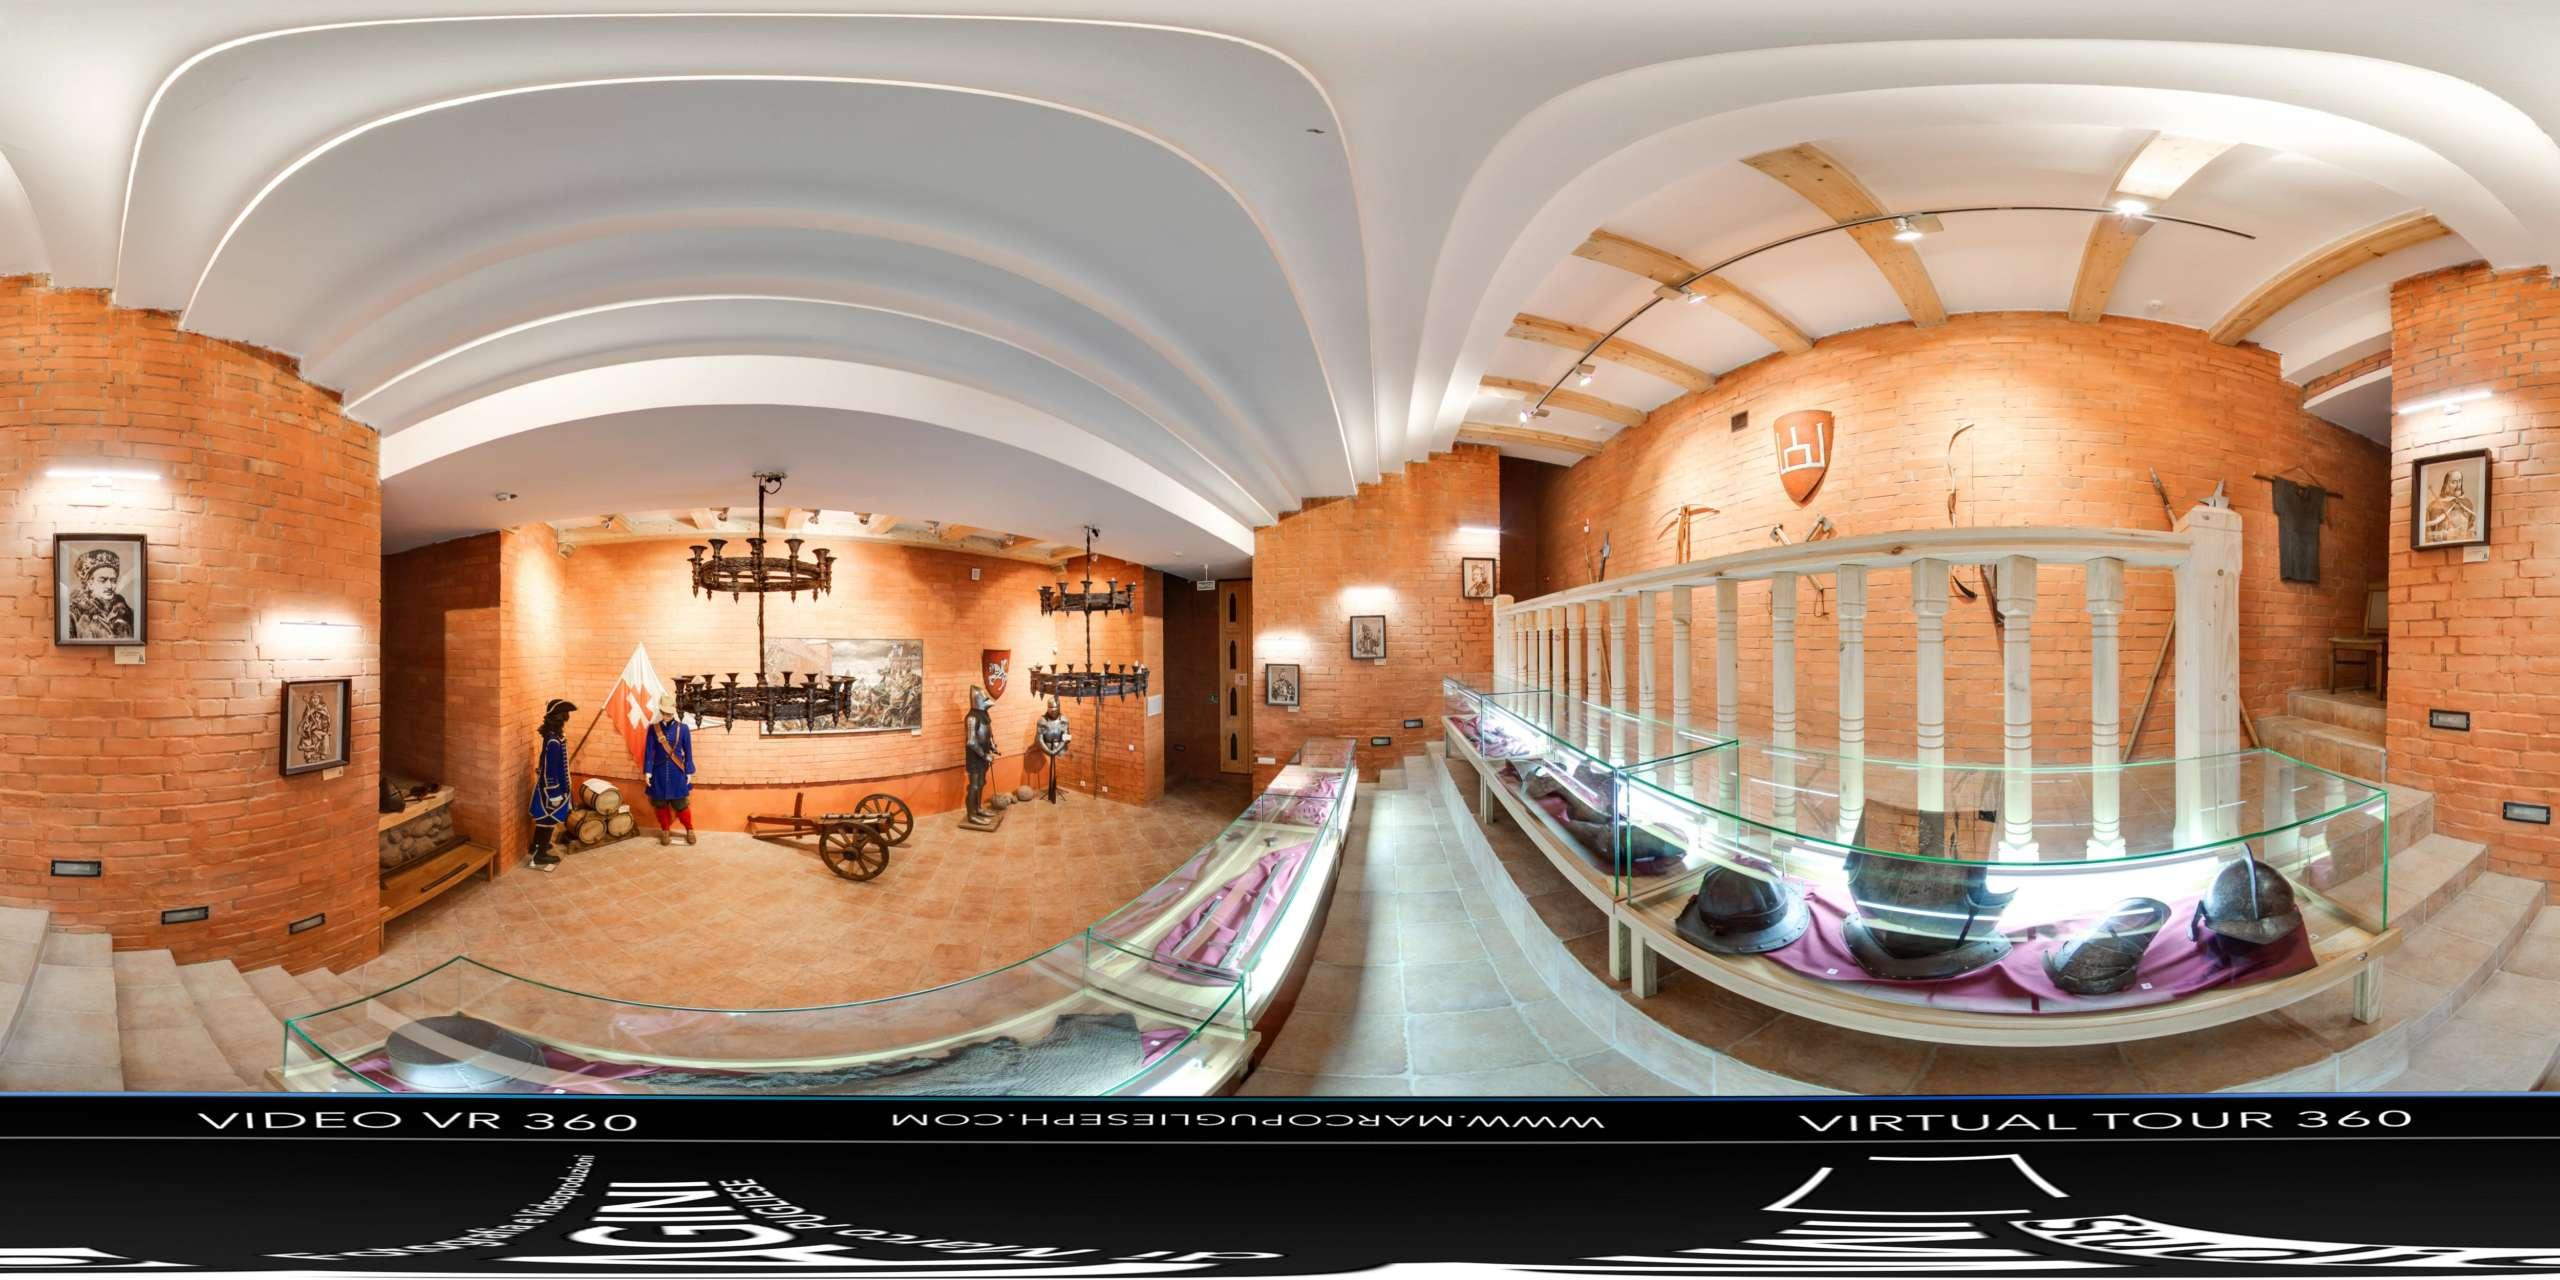 virtual tour 360 Museo